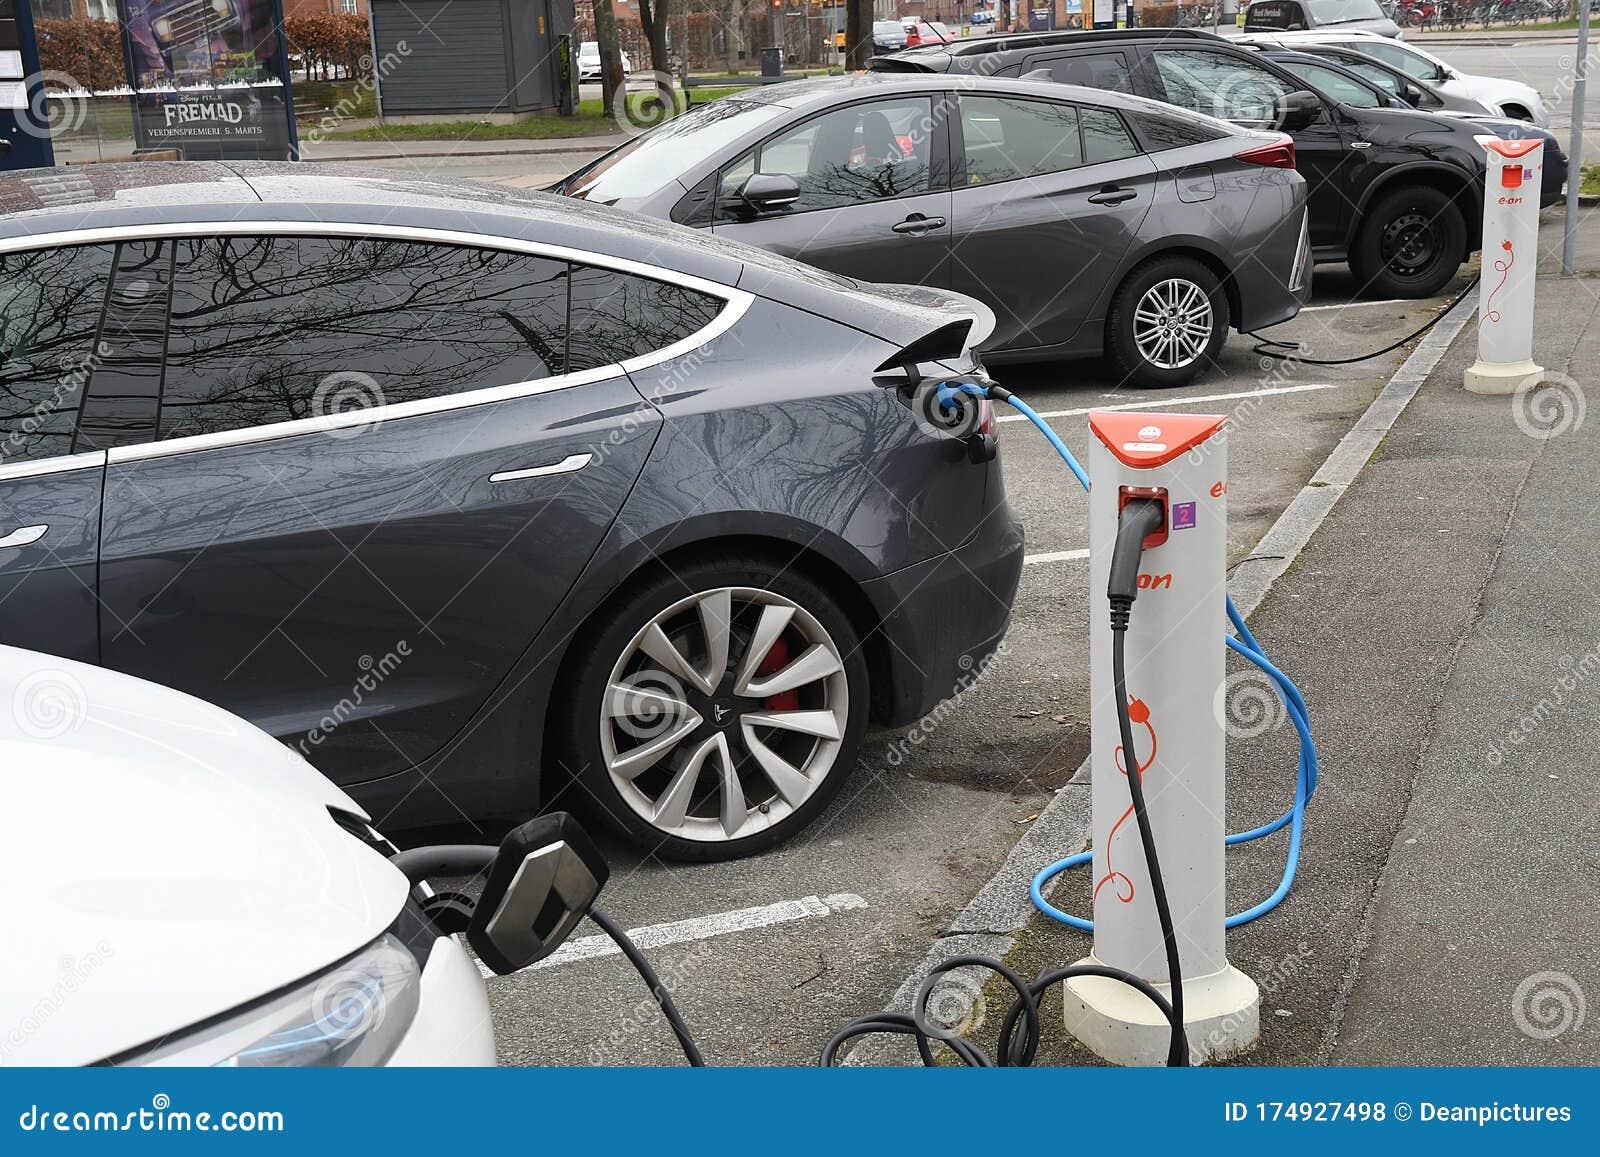 Electirc Auto At Charge Point N Copenhagen Editorial Stock Photo Image Of Electir Autos 174927498